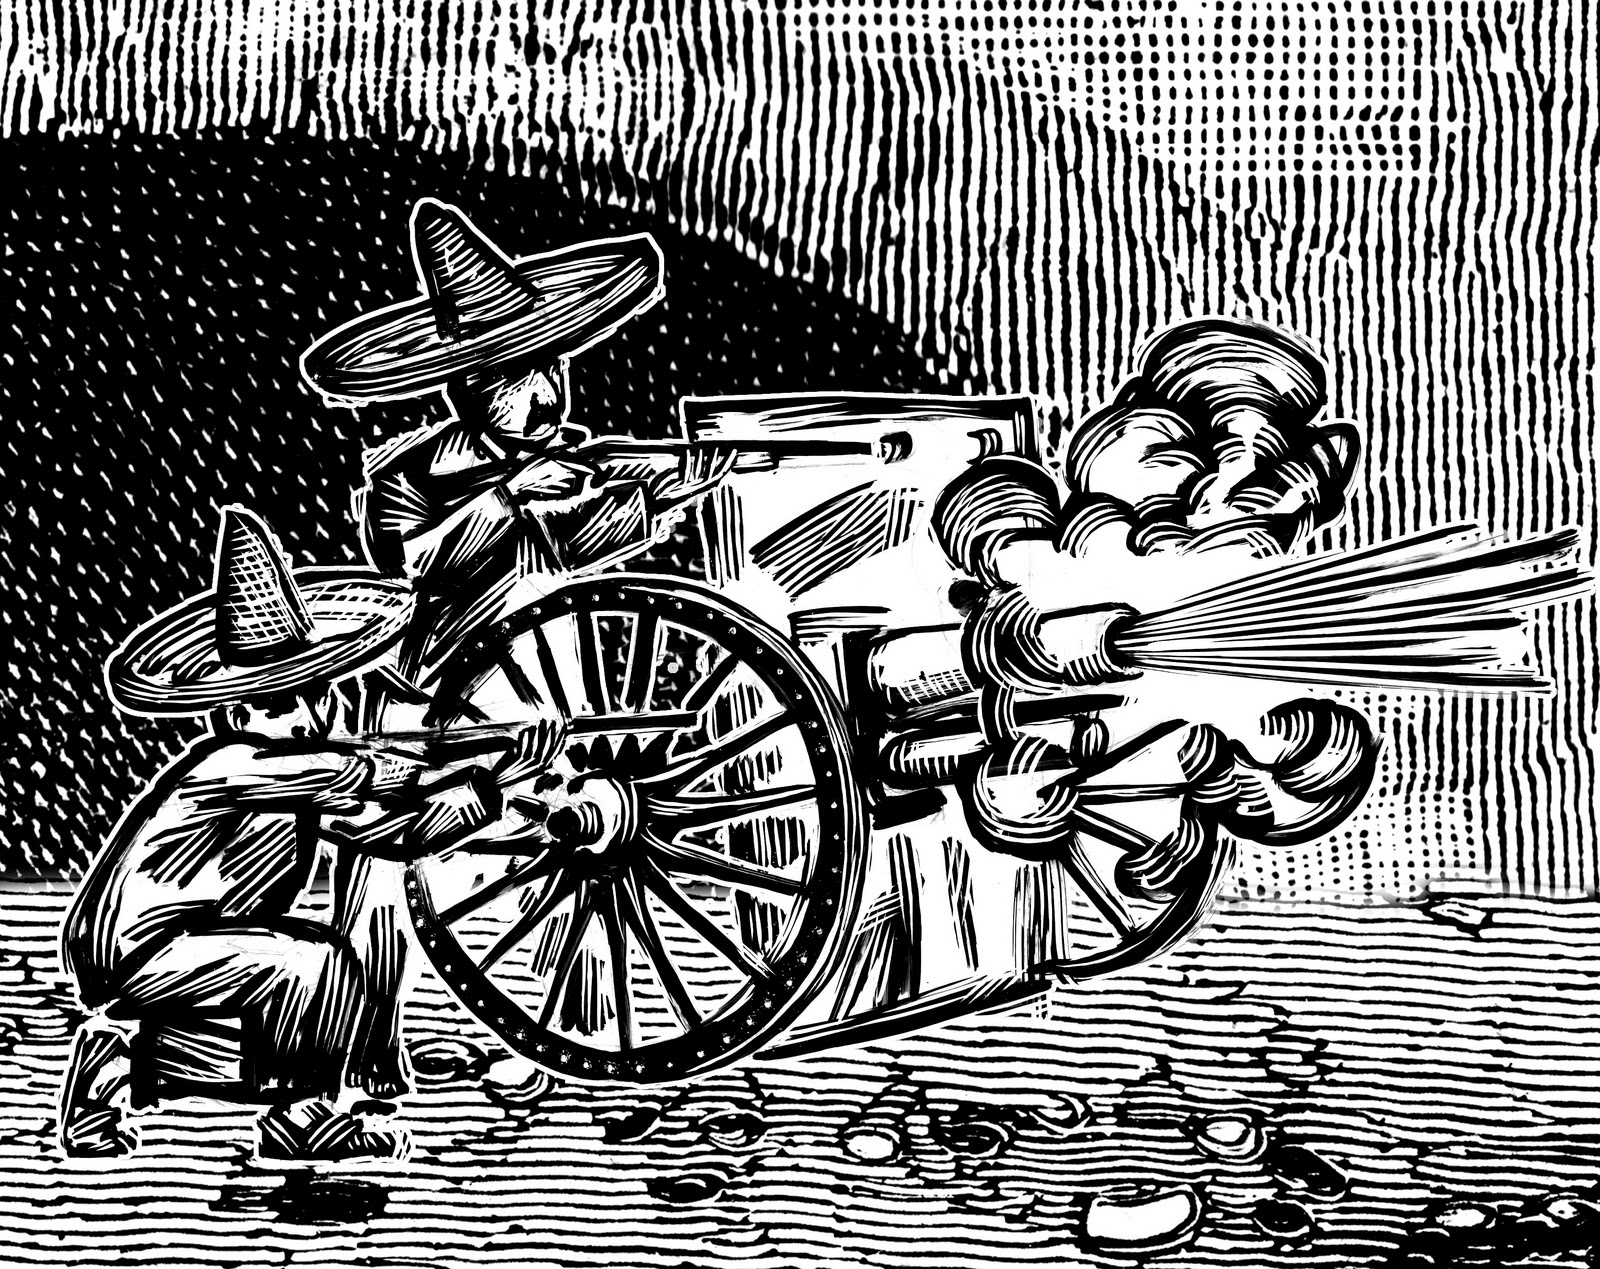 Revolucion Mexicana Dibujos | www.imgkid.com - The Image